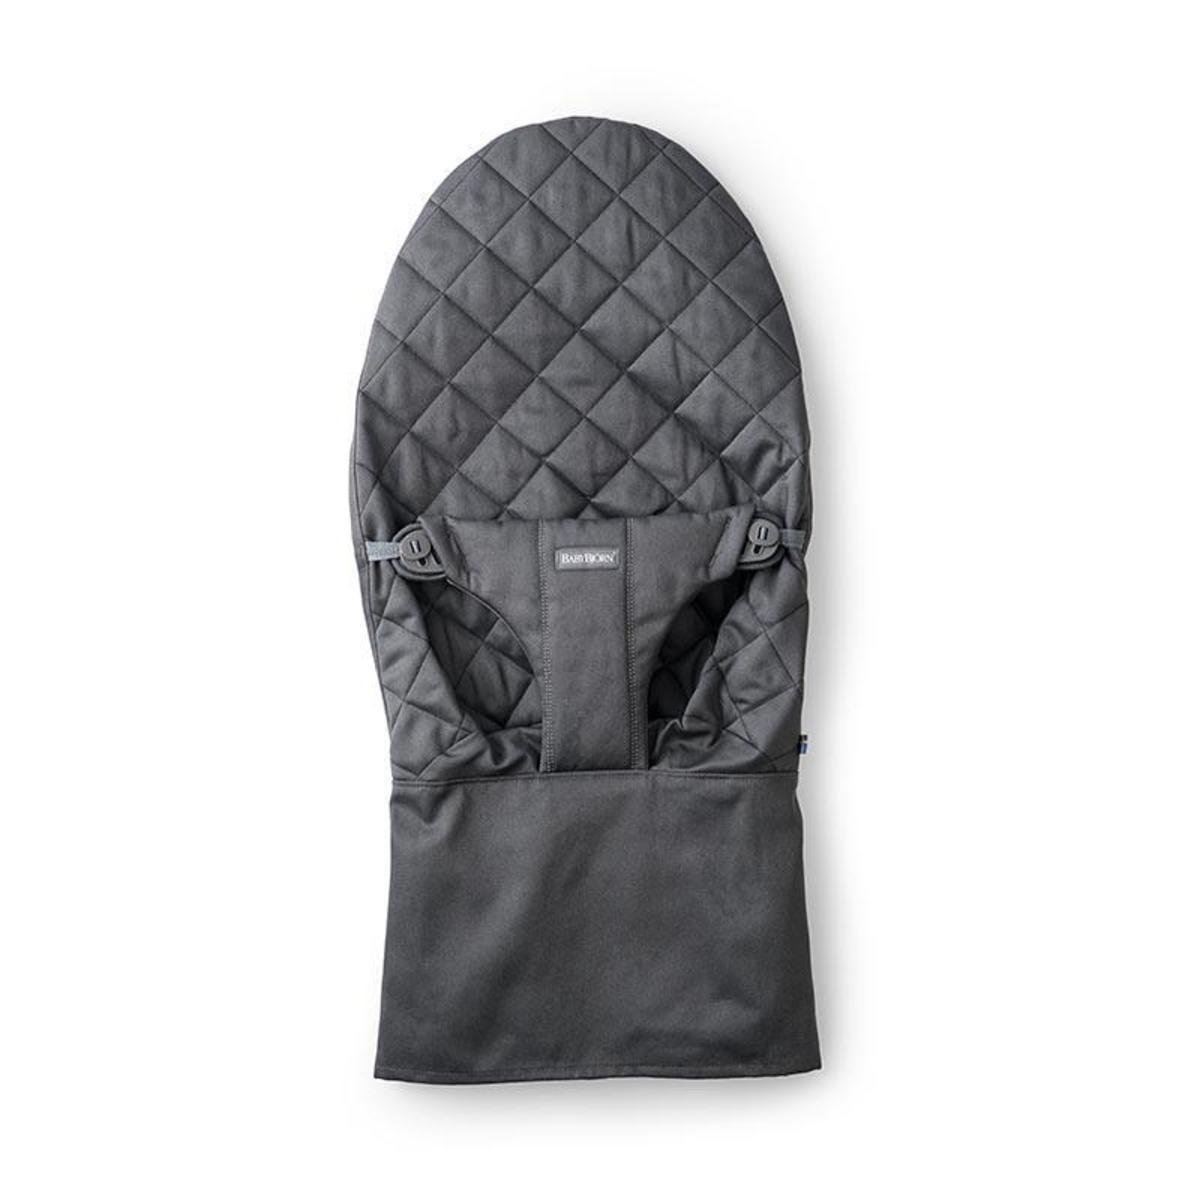 c07b5df7d3b Fabric Seat for Bouncer Baby Rocker Cover Swedish Brand (6 colors) - Smoke  gray